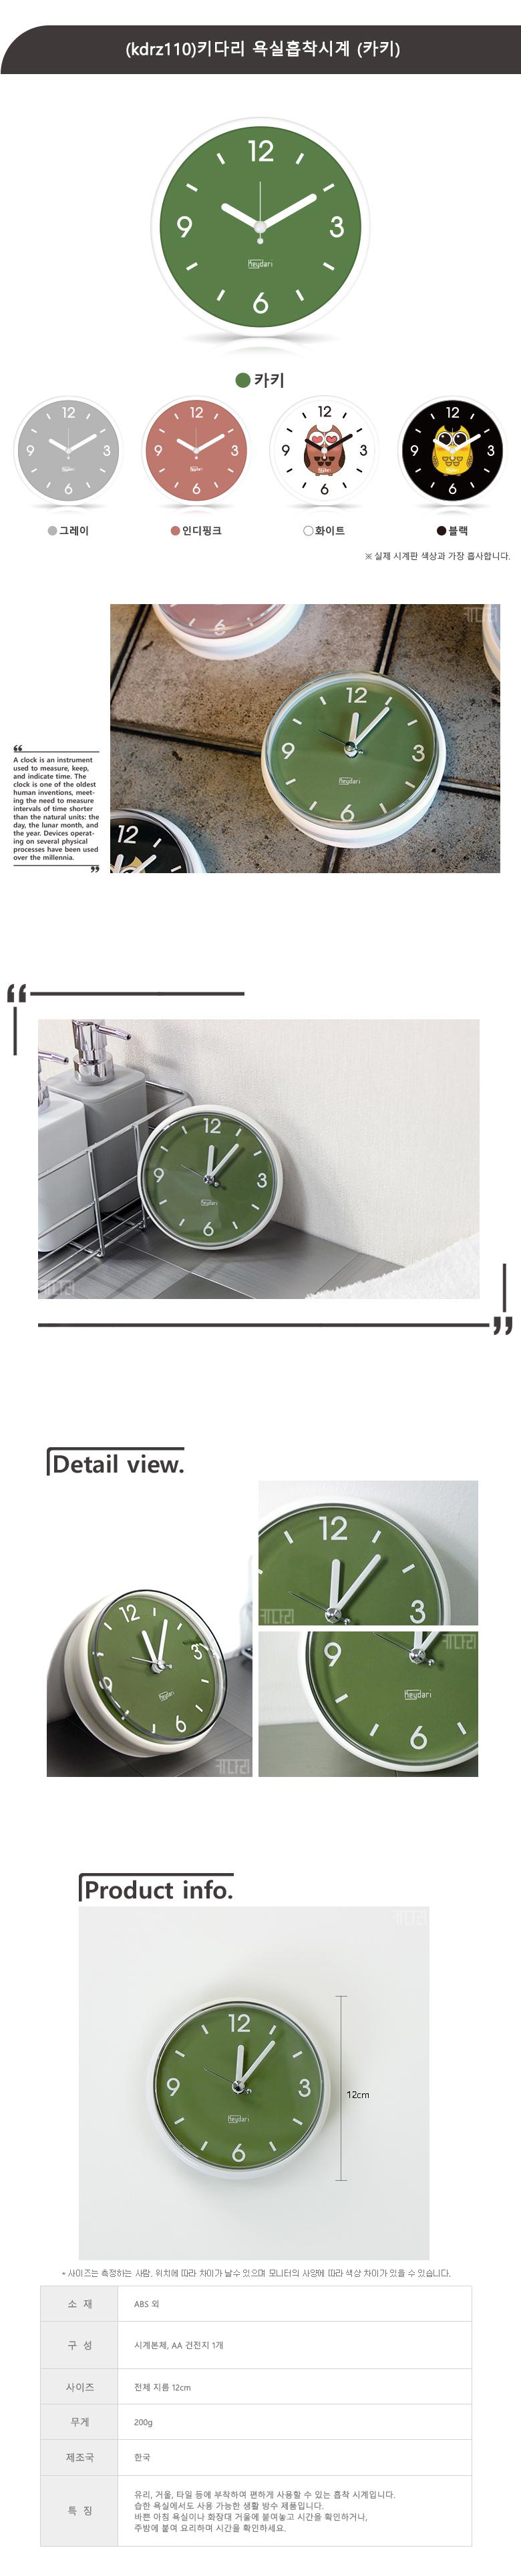 (kdrz110)키다리 욕실흡착시계 (카키)8,900원-키다리인테리어, 시계, 벽시계, 흡착바보사랑(kdrz110)키다리 욕실흡착시계 (카키)8,900원-키다리인테리어, 시계, 벽시계, 흡착바보사랑